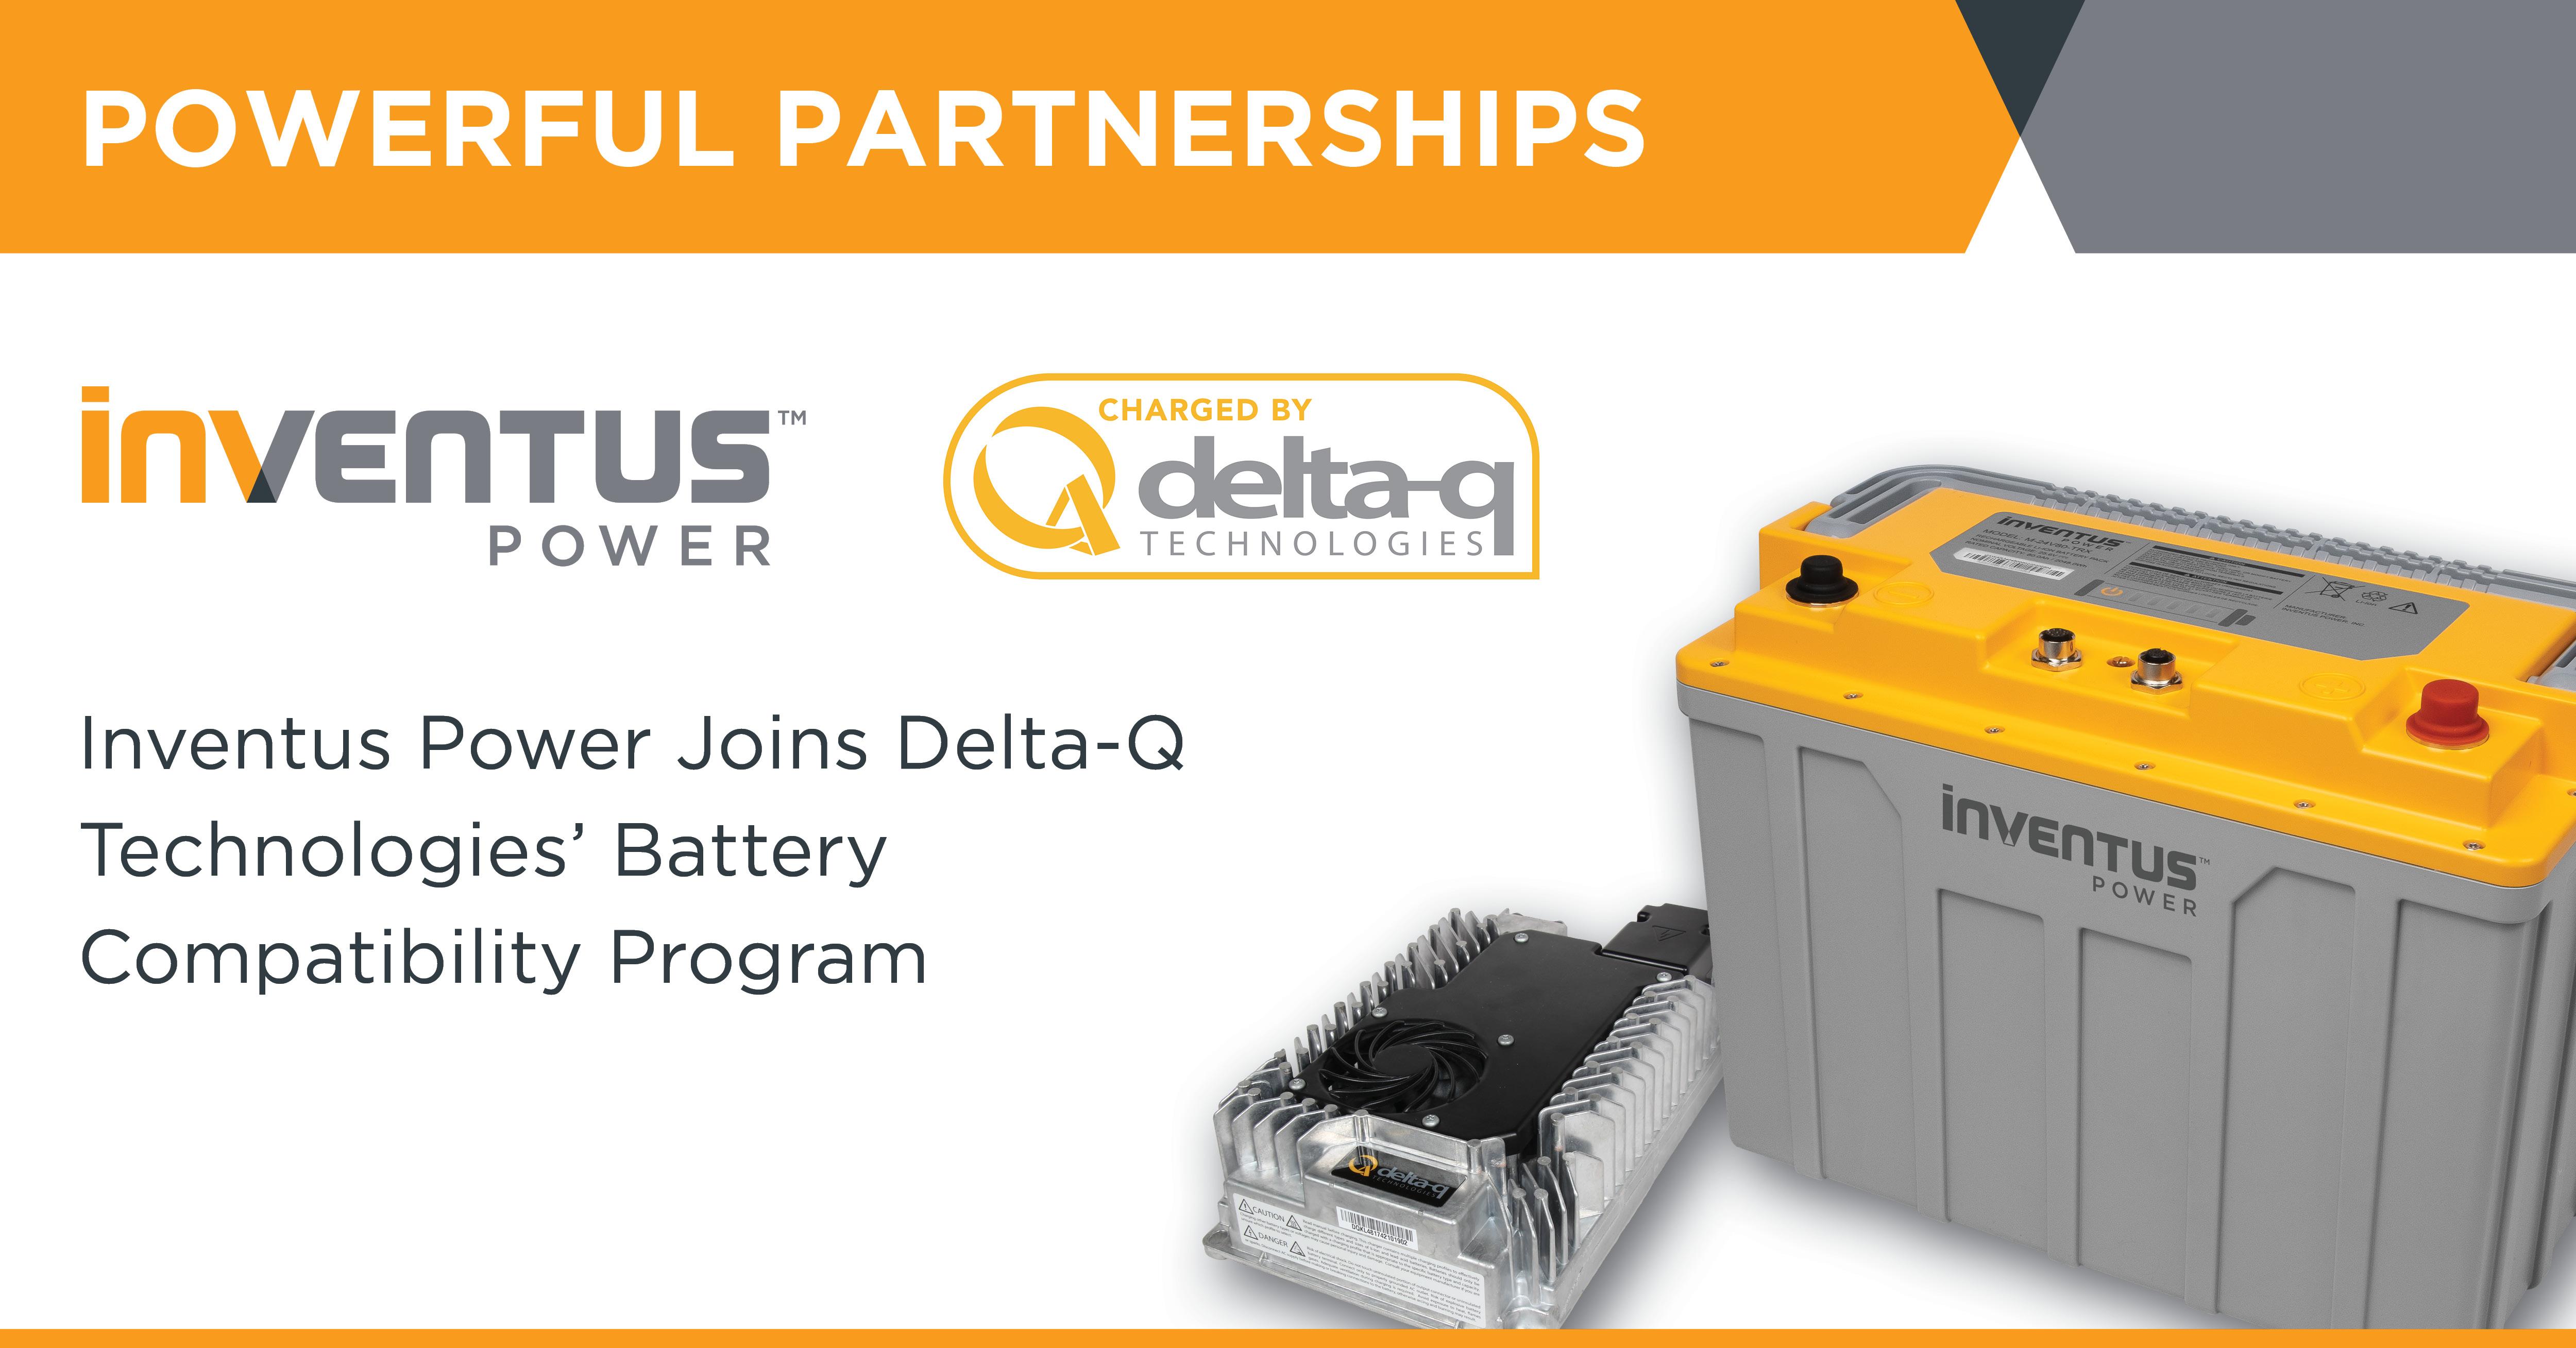 Inventus Power_Delta-Q Partnership_V4